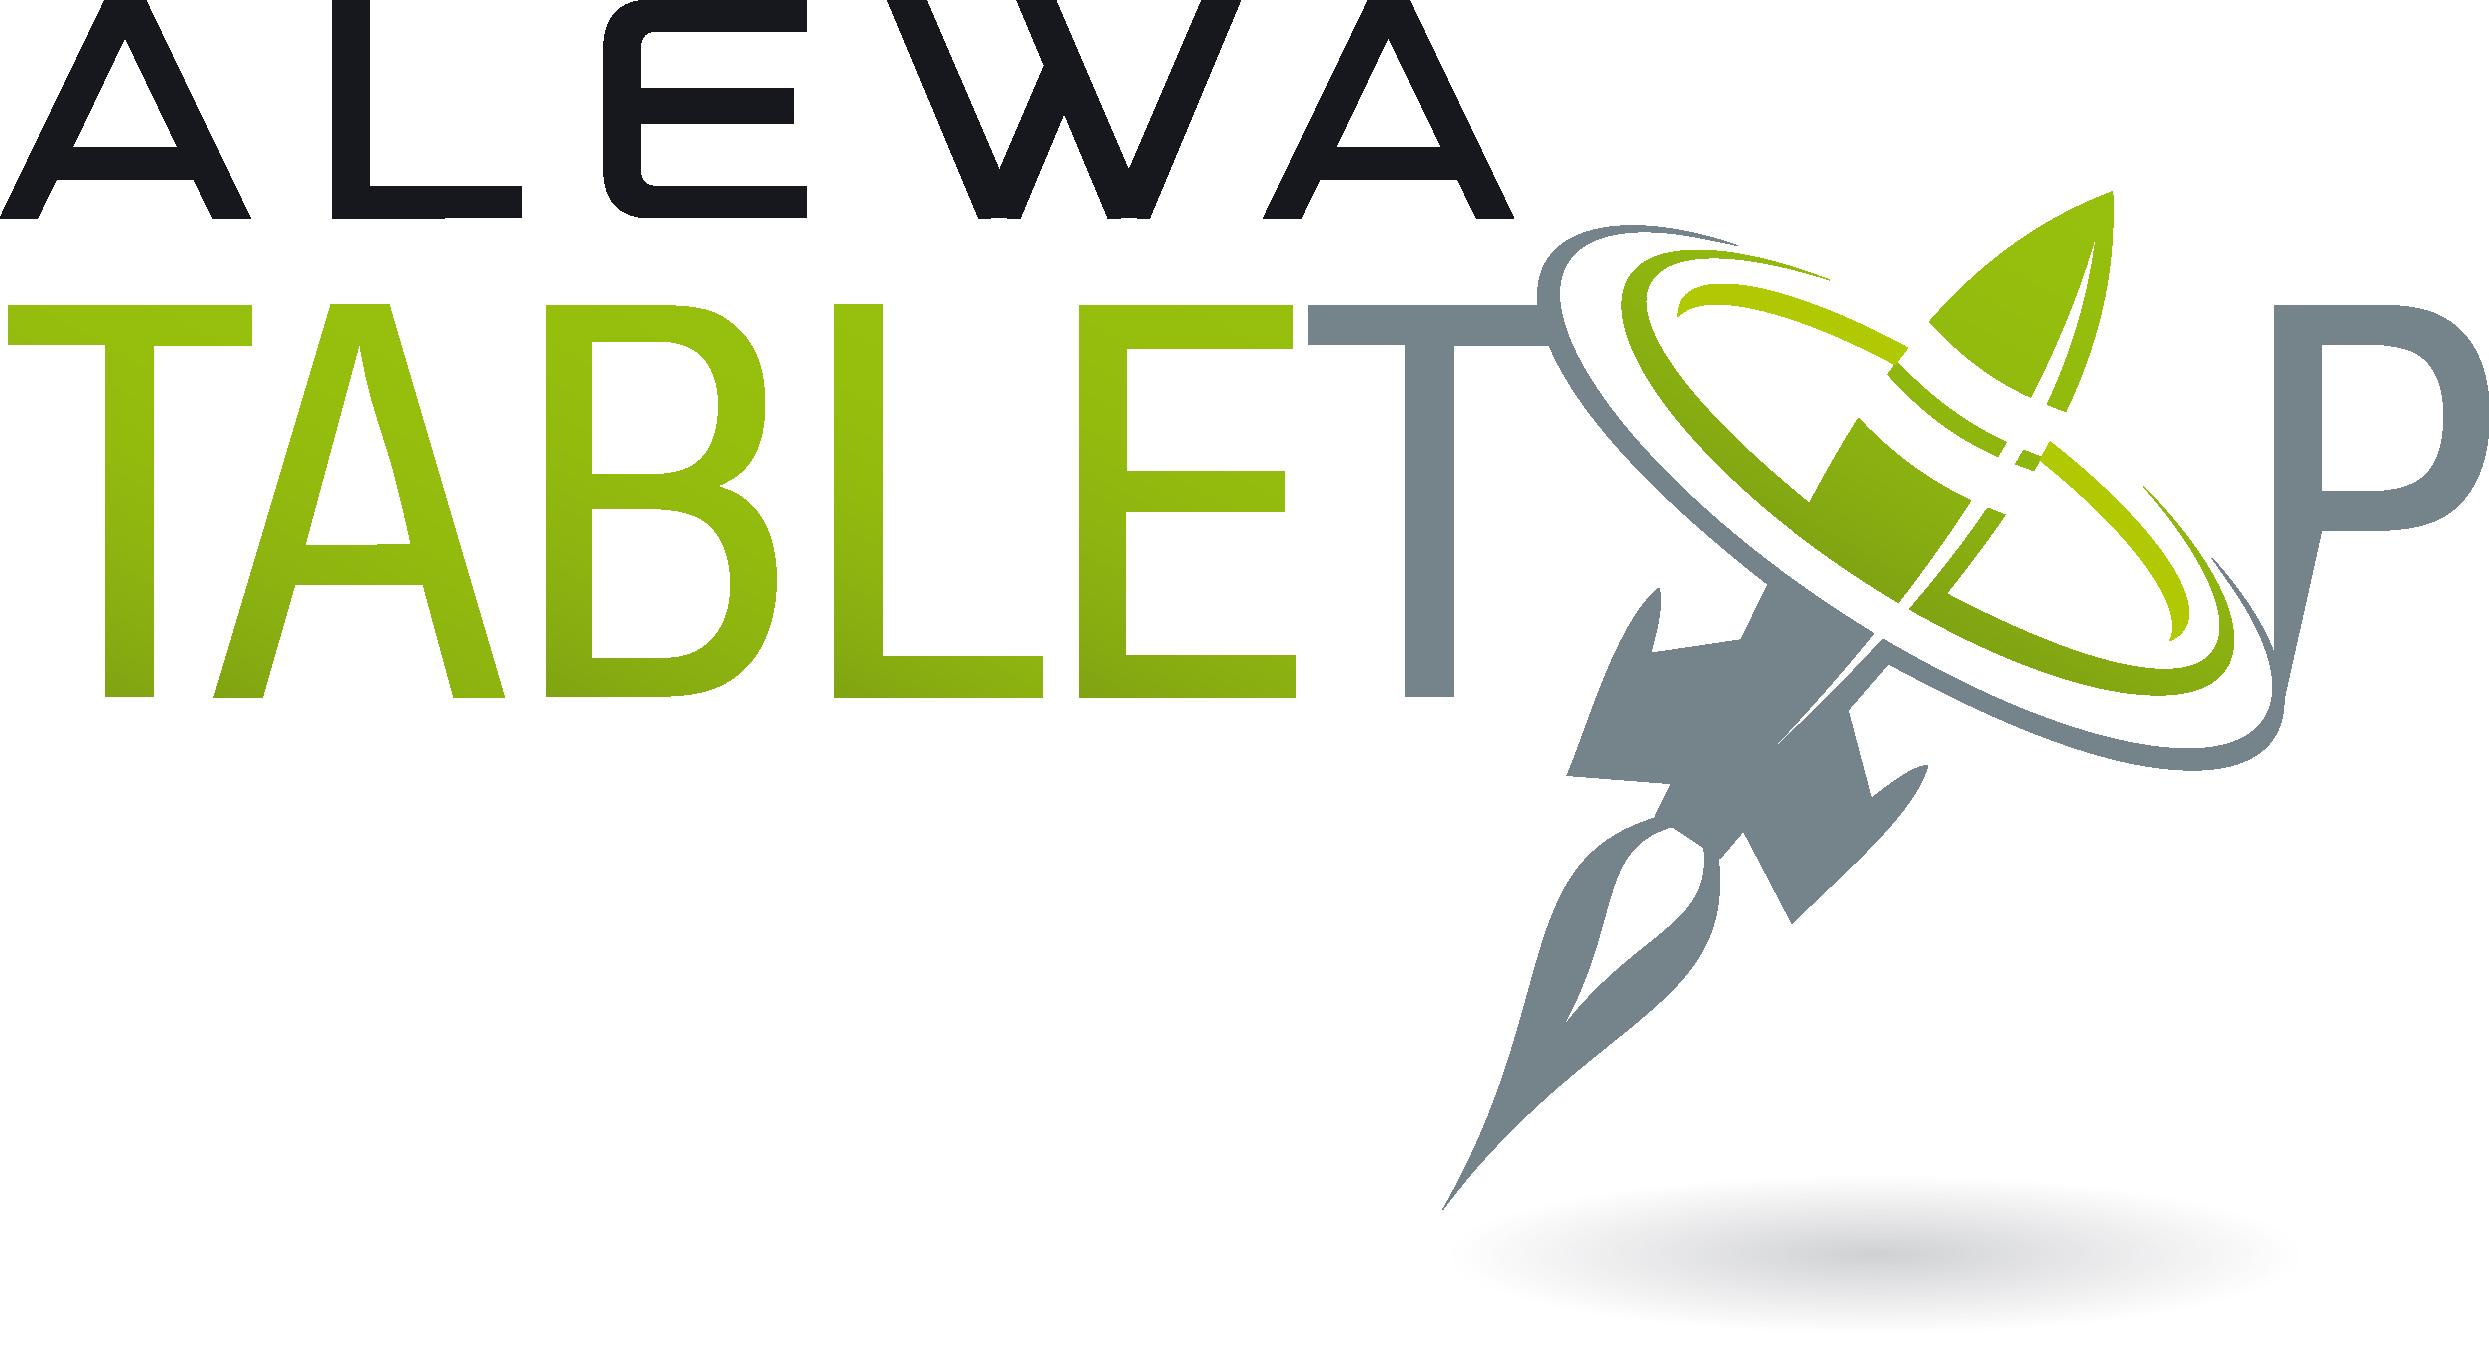 ALEWA Tabletopshop